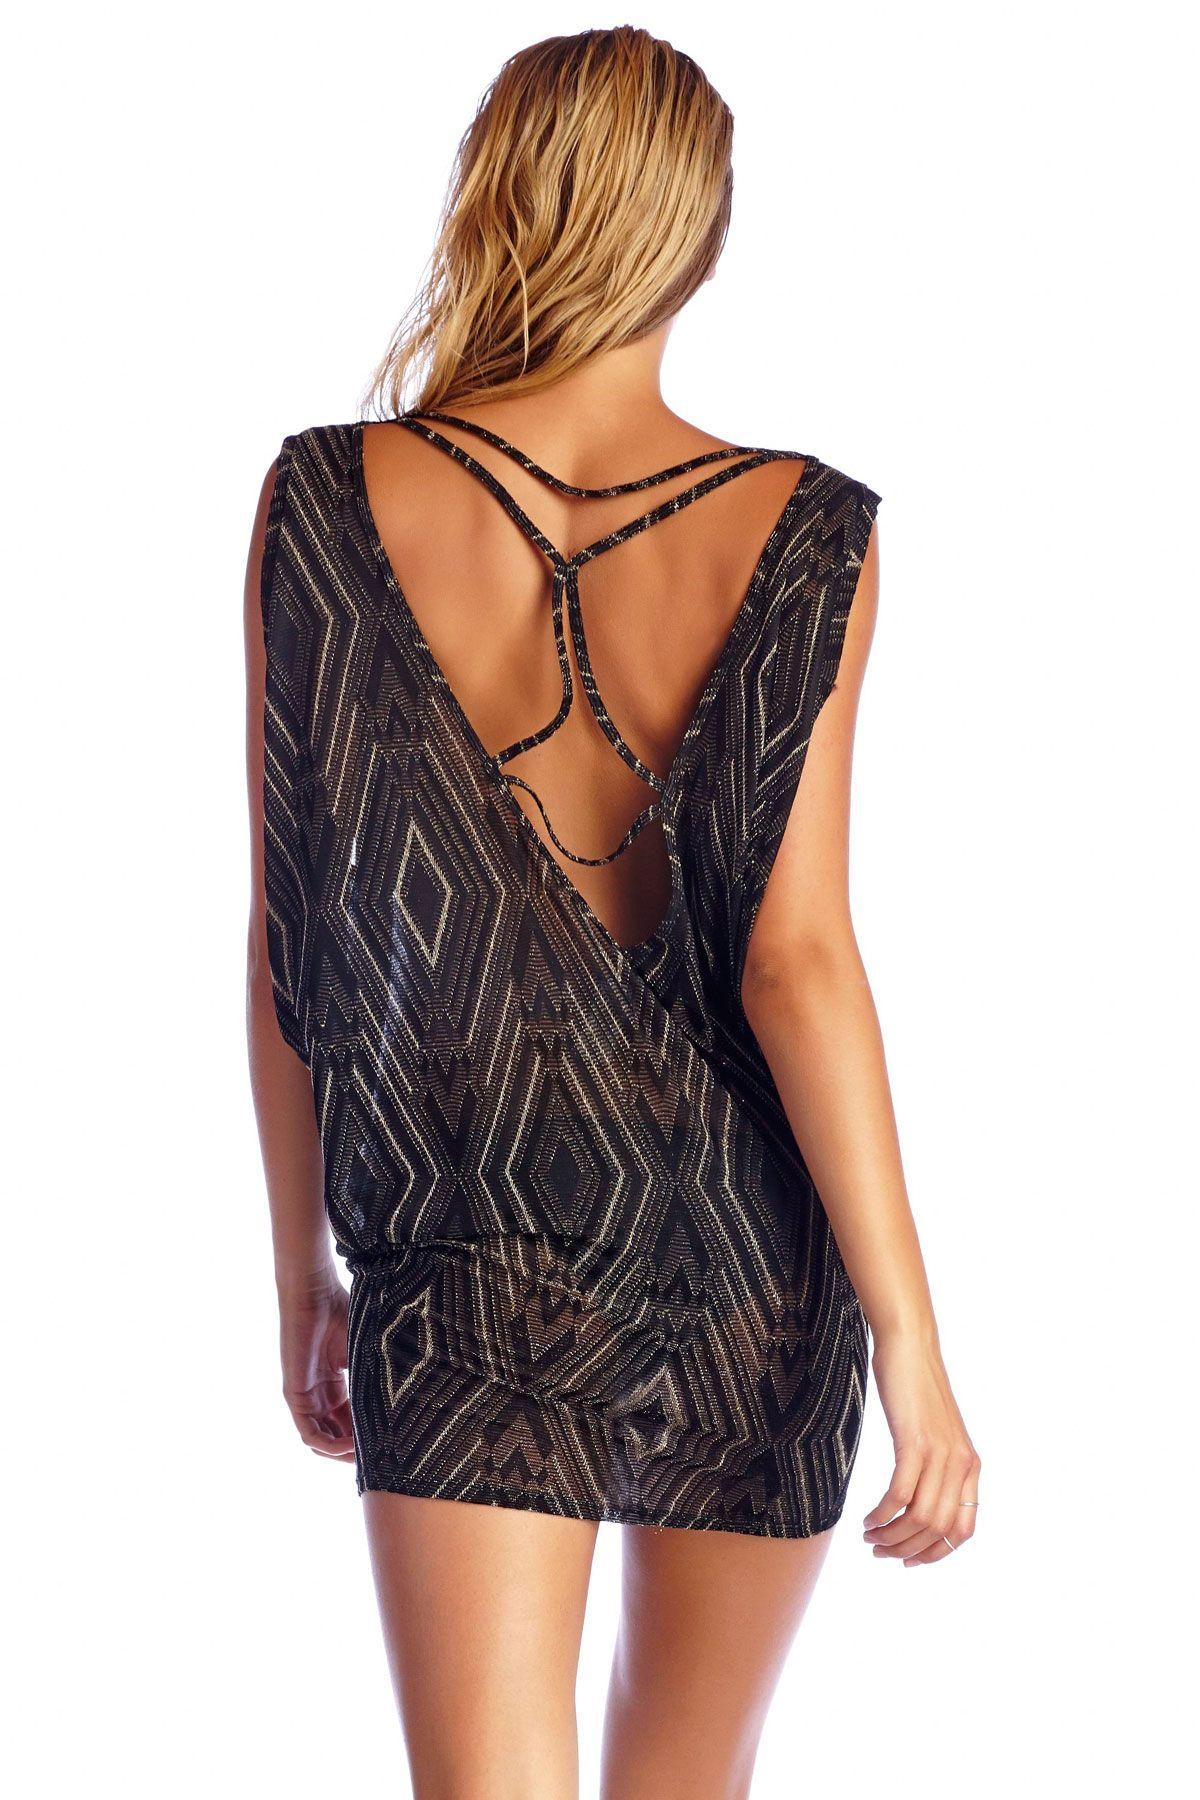 Vitamin aus black diamond crochet dress everything but water on